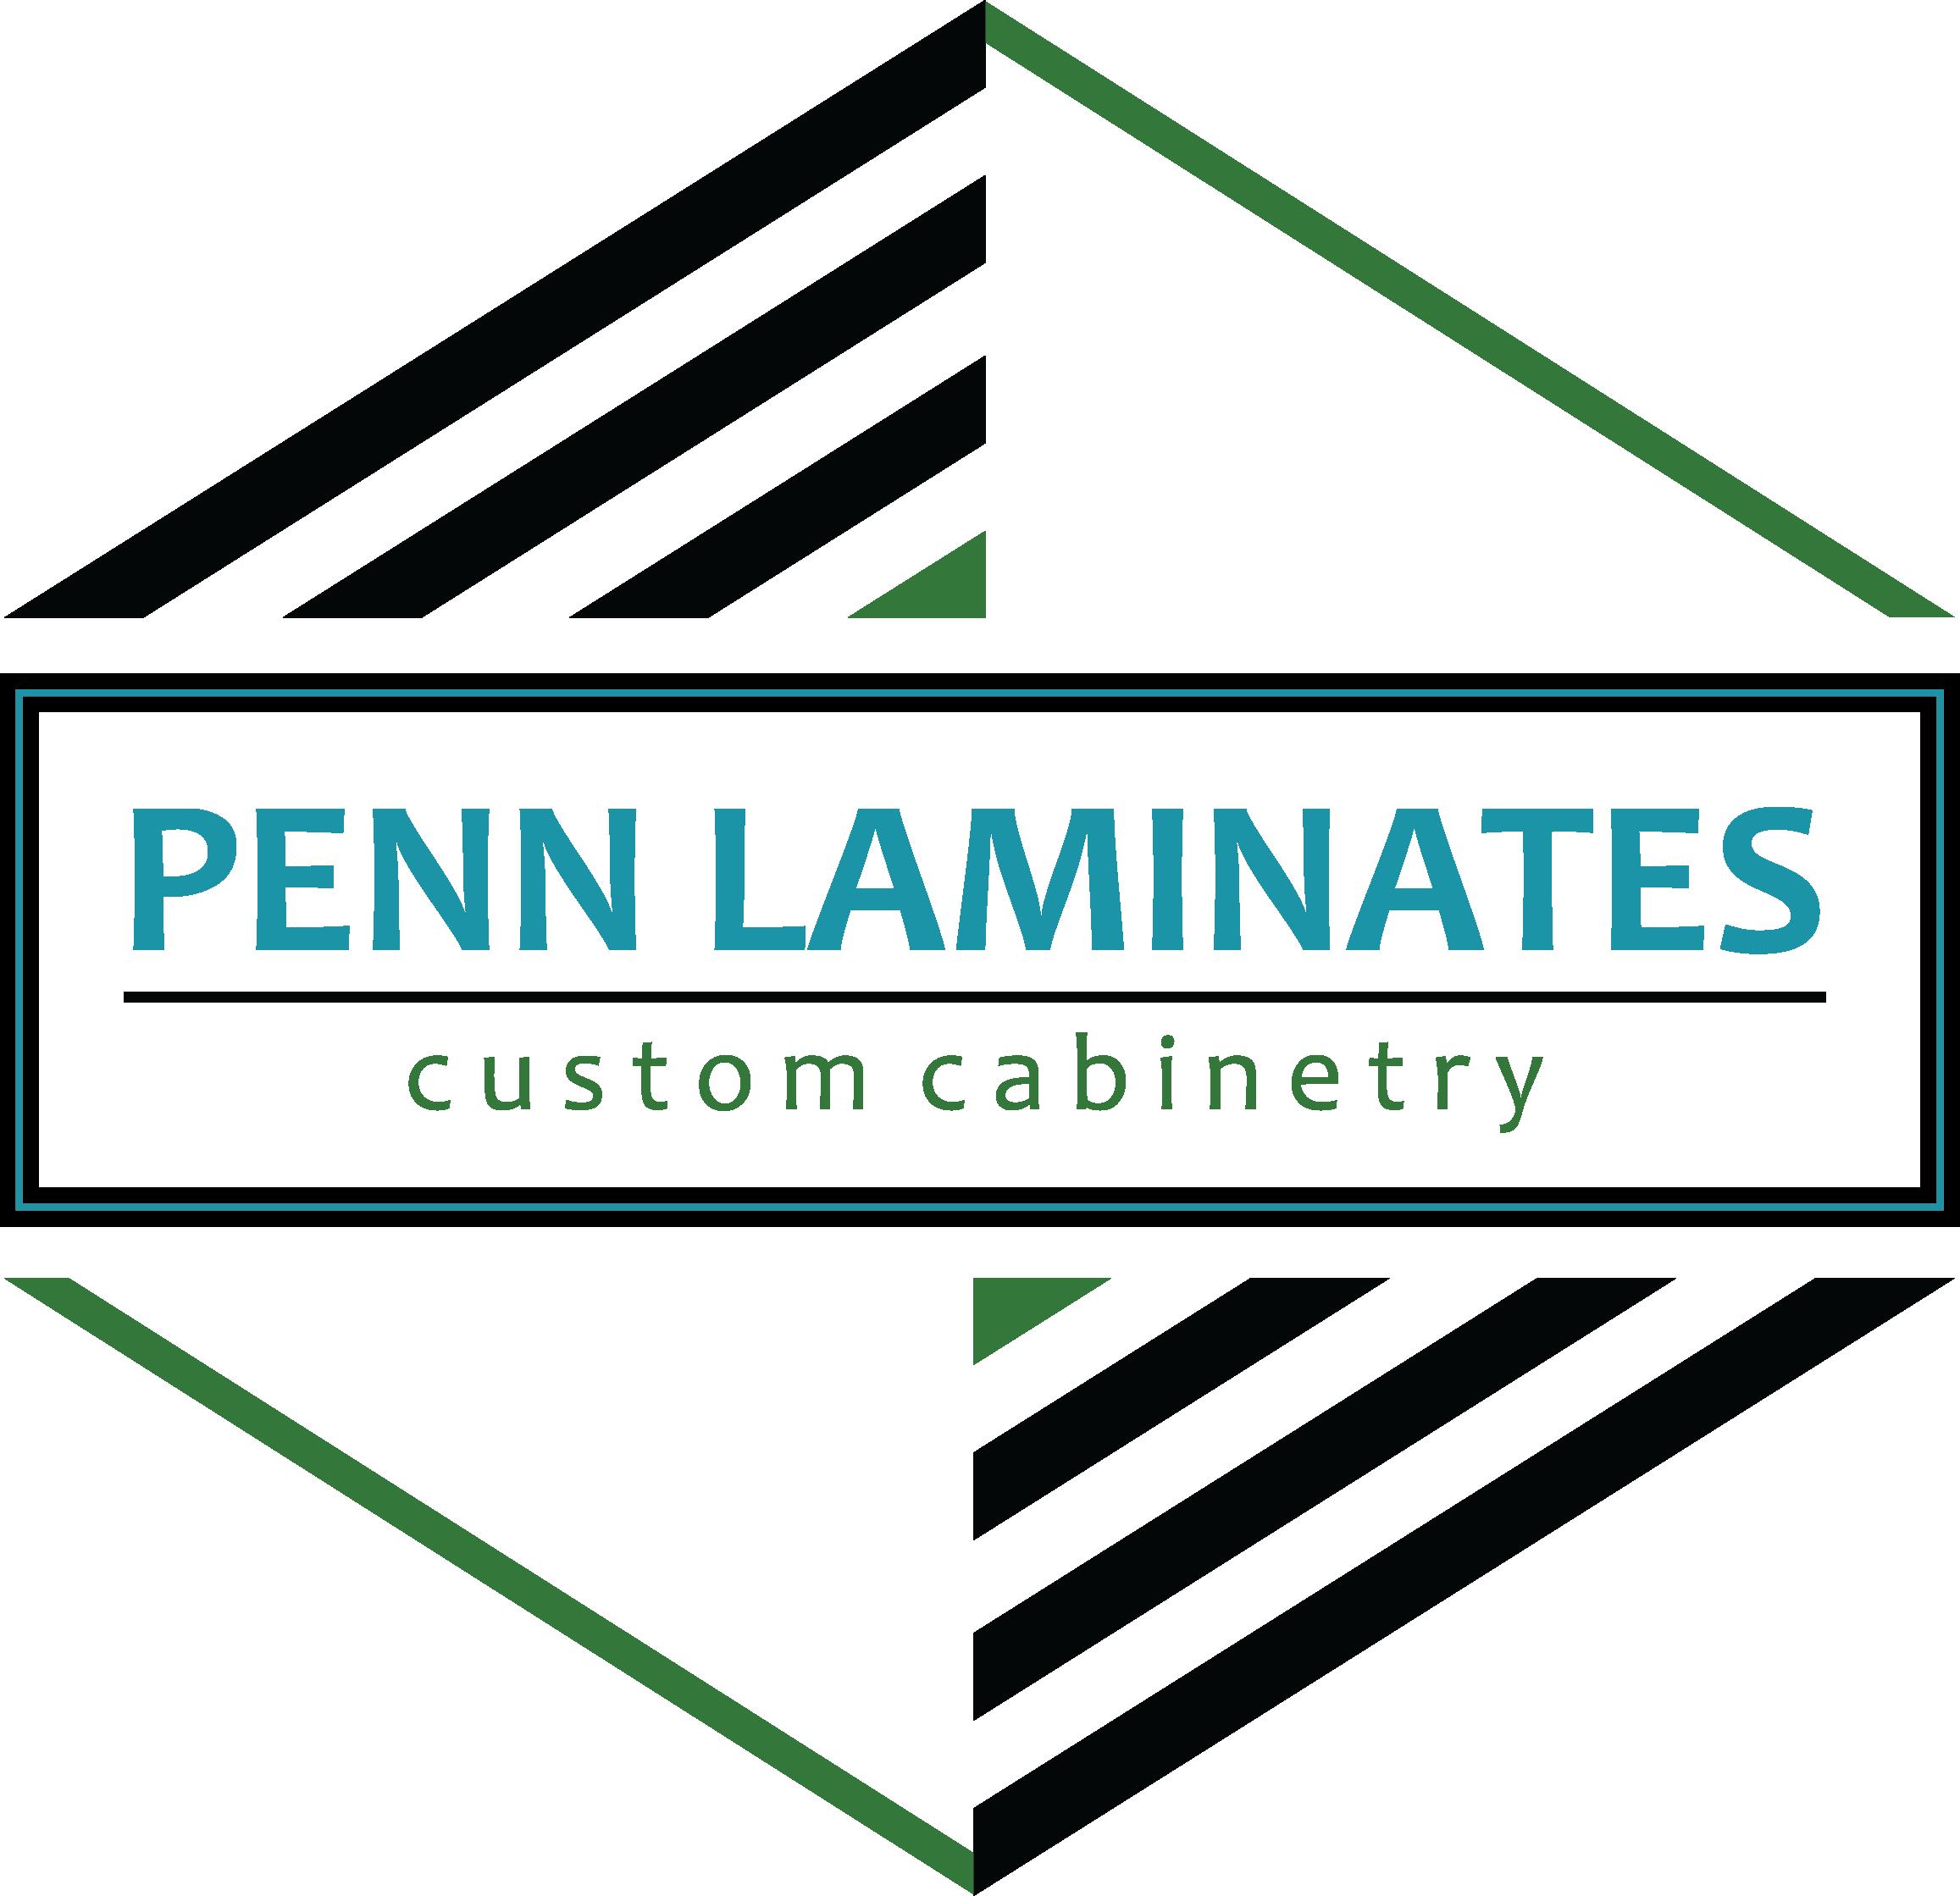 Penn Laminates